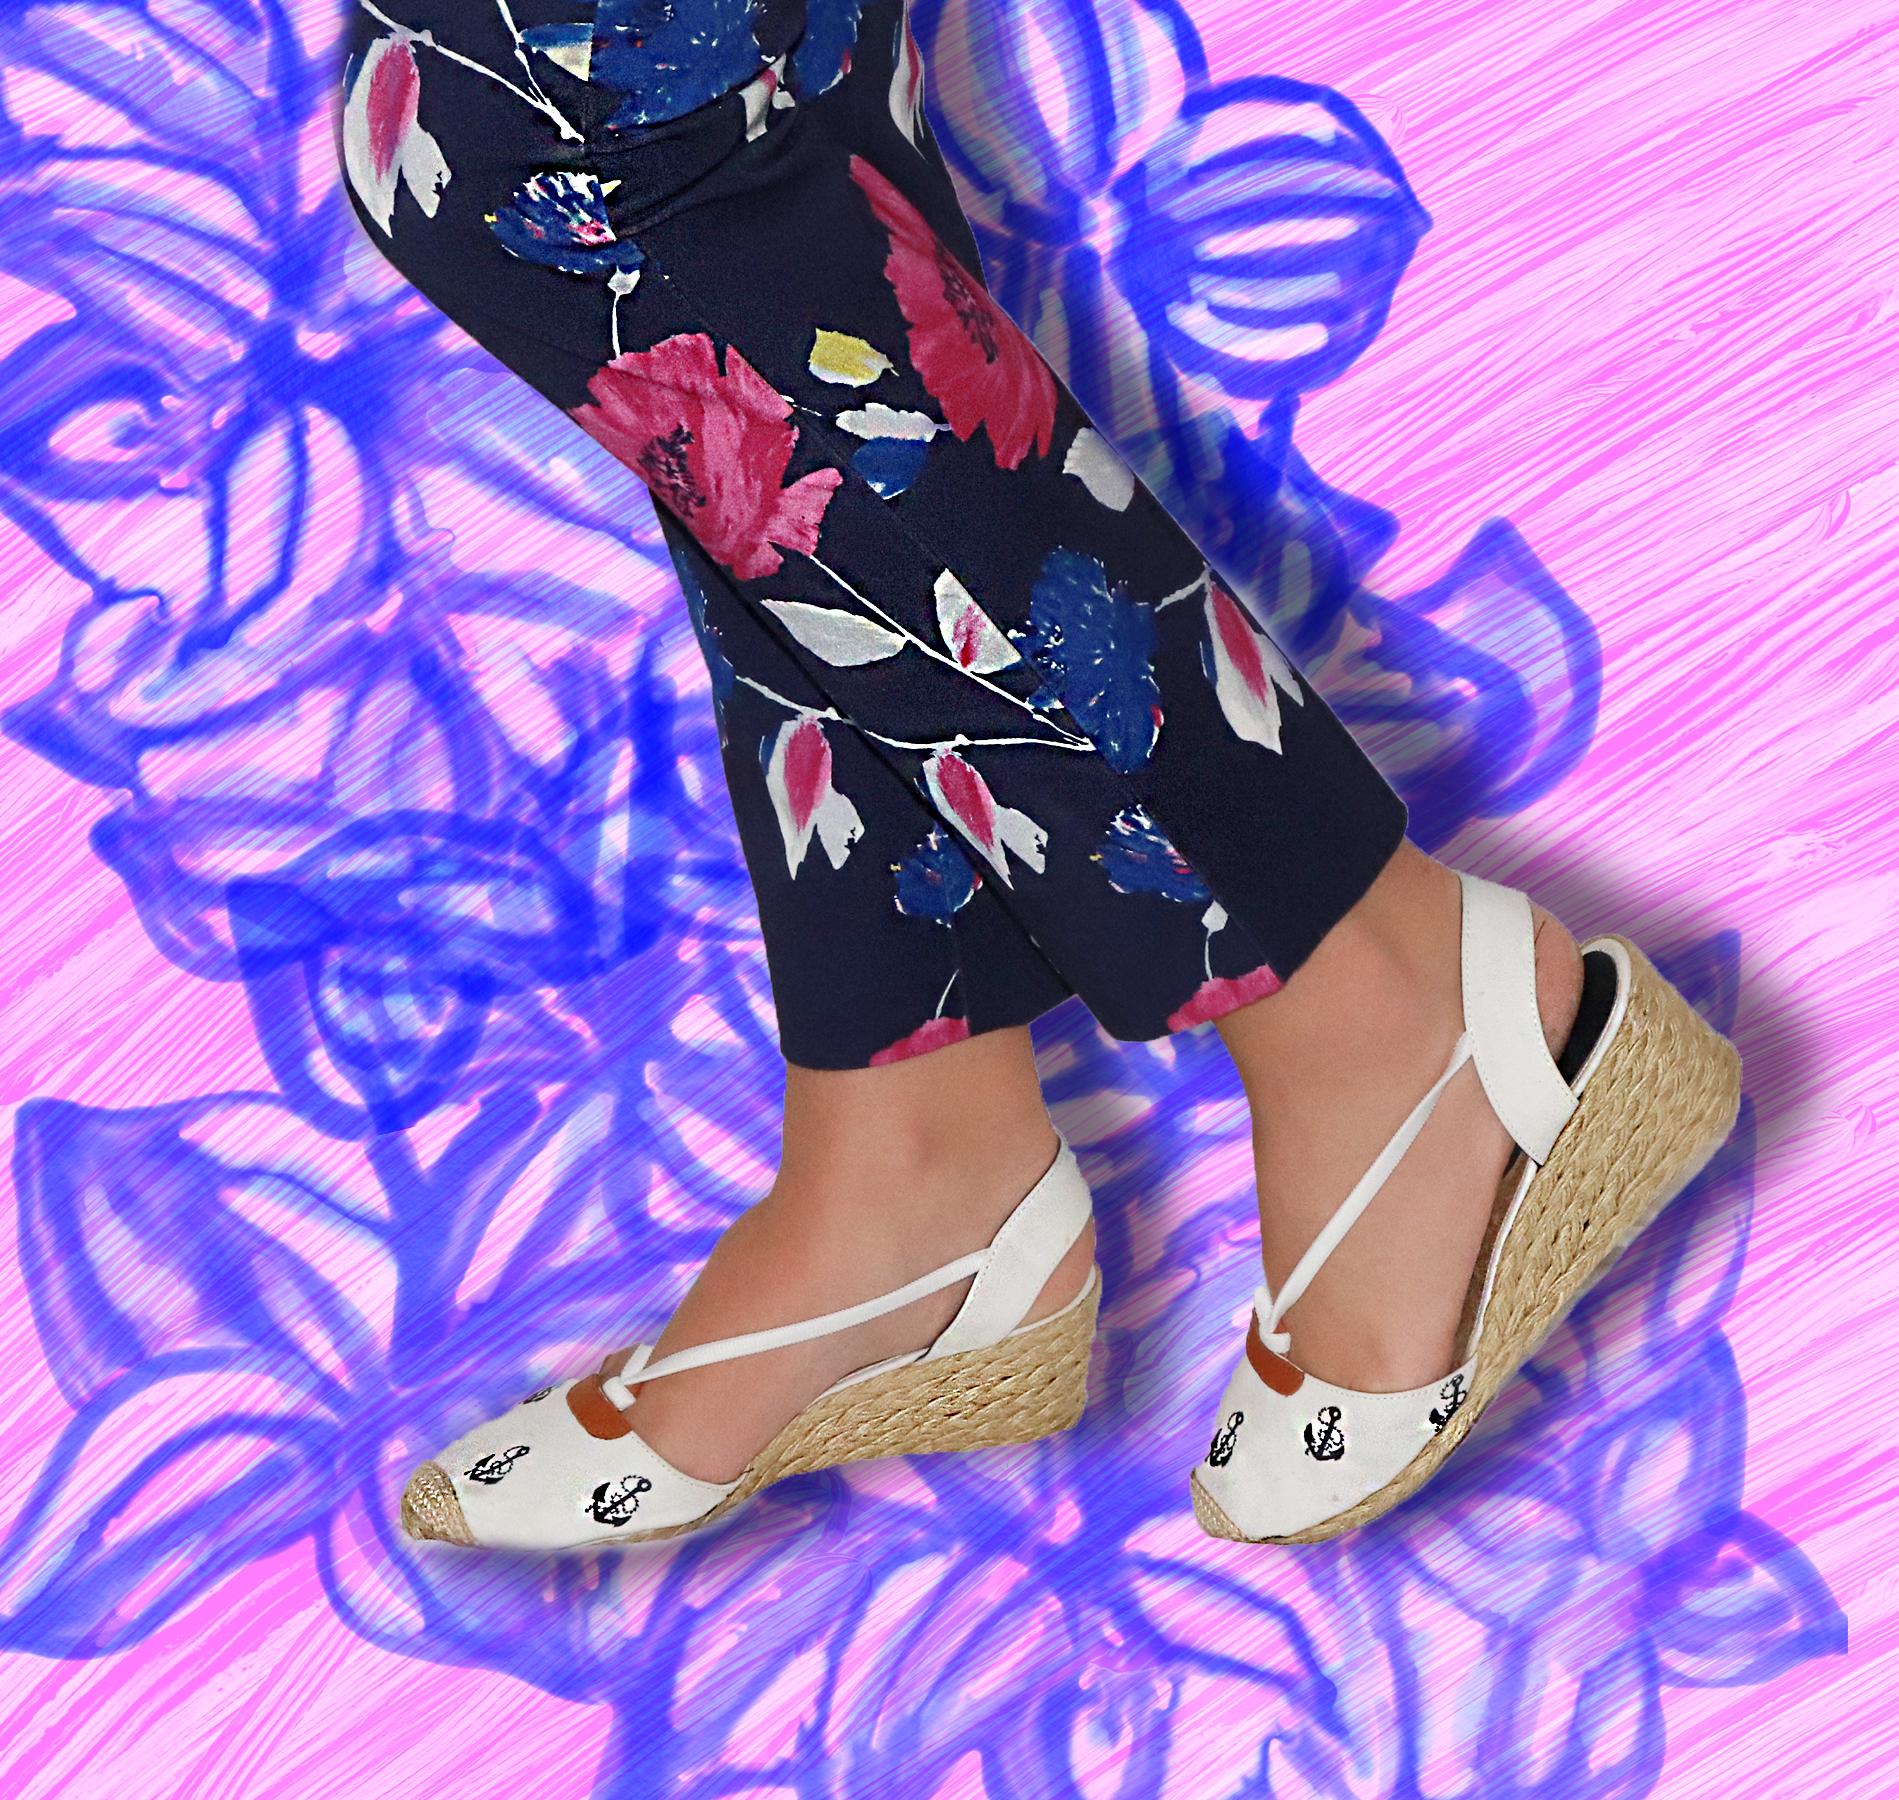 floral shoe detail.jpg